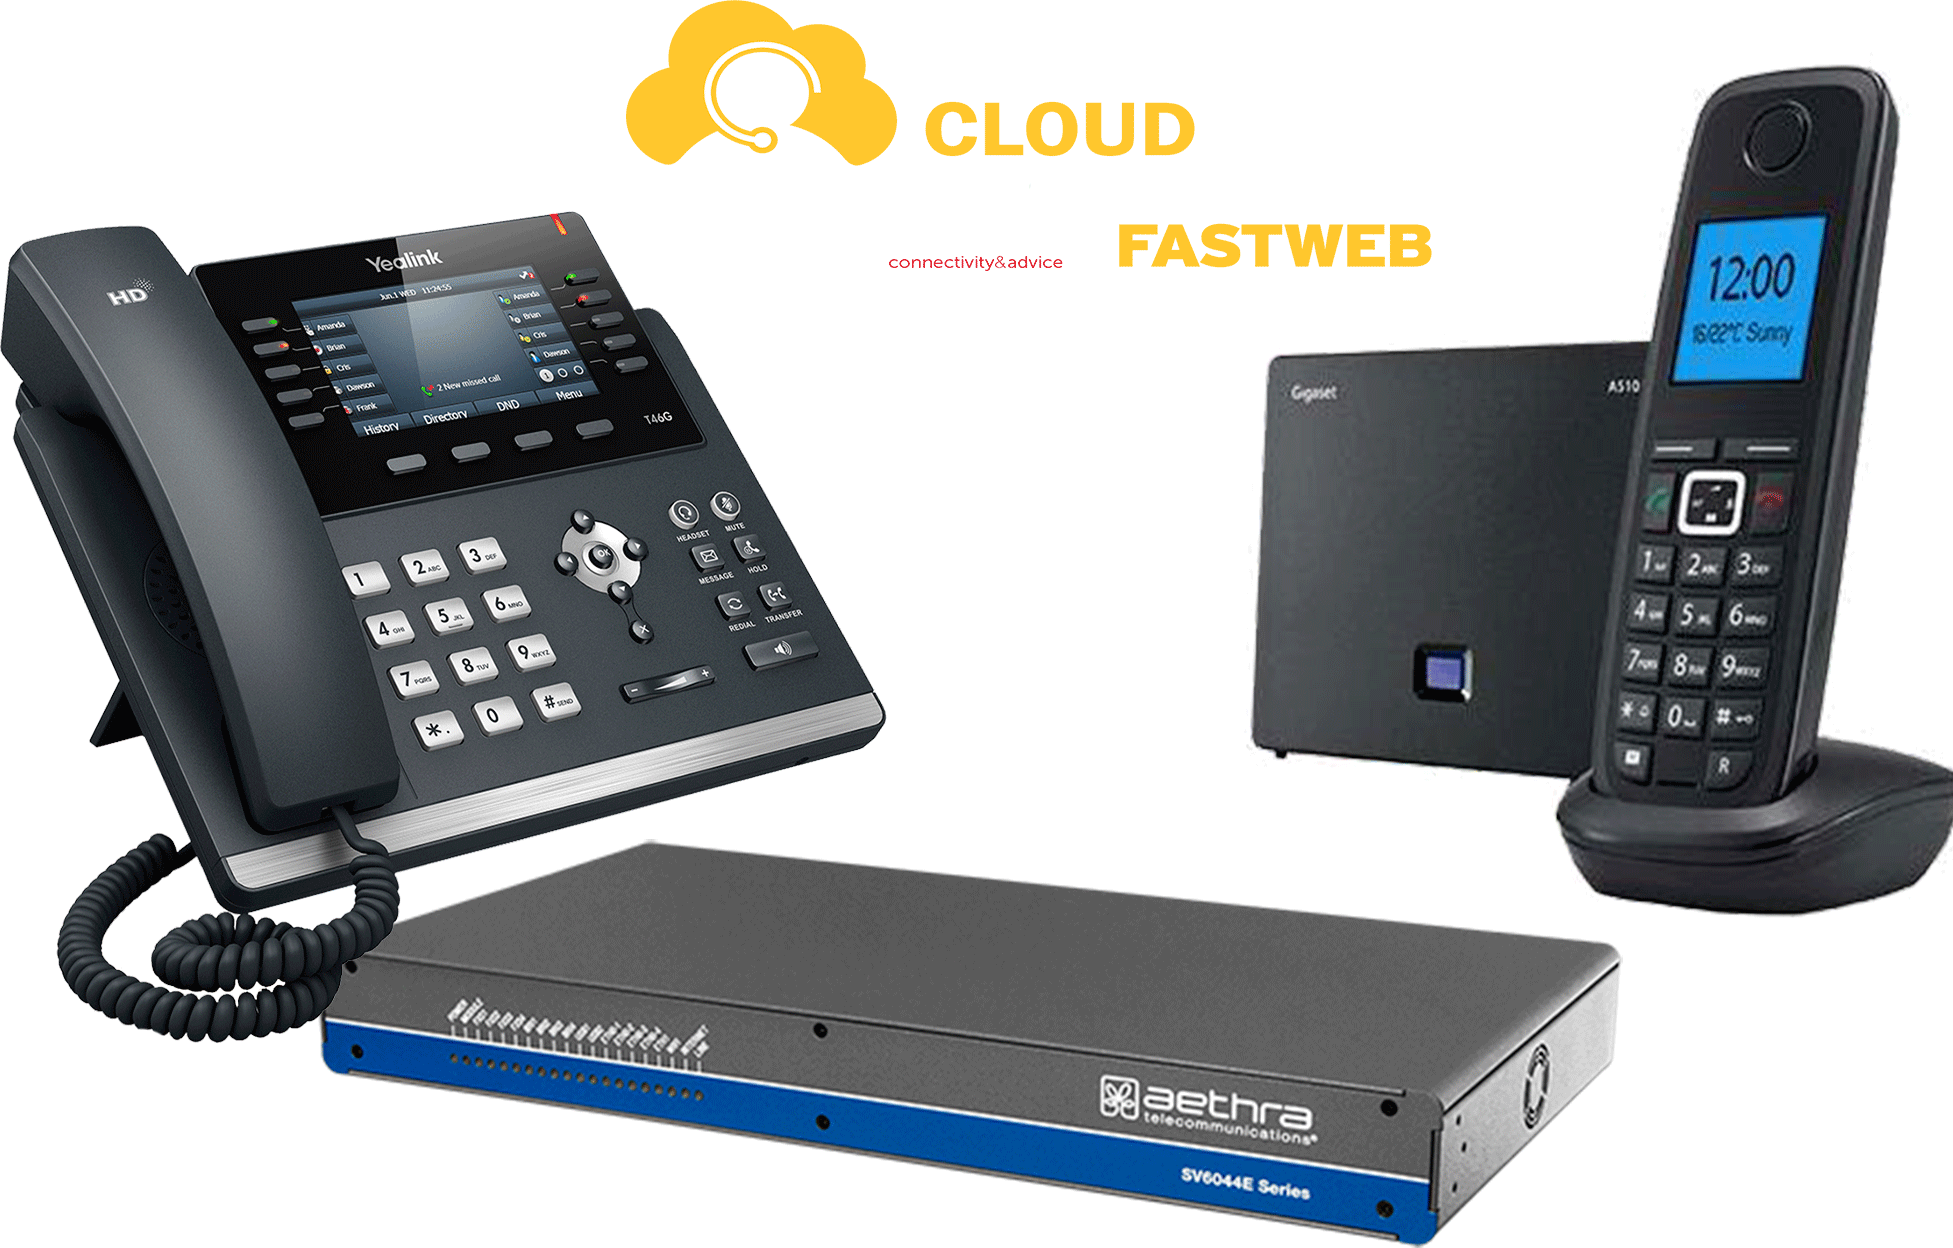 Centralino Cloud Telefoni